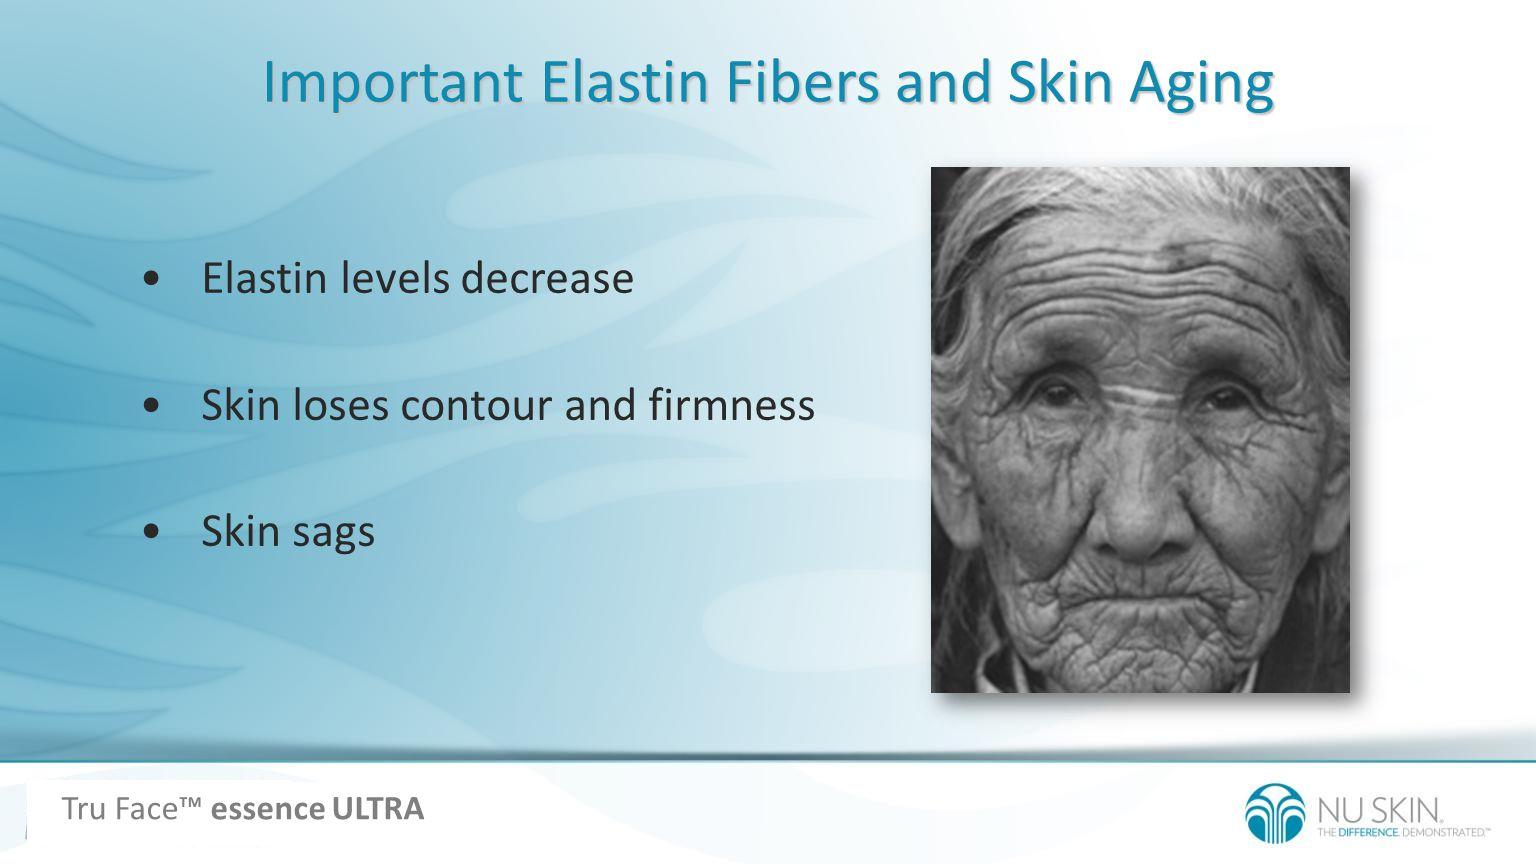 Important Elastin Fibers and Skin Aging